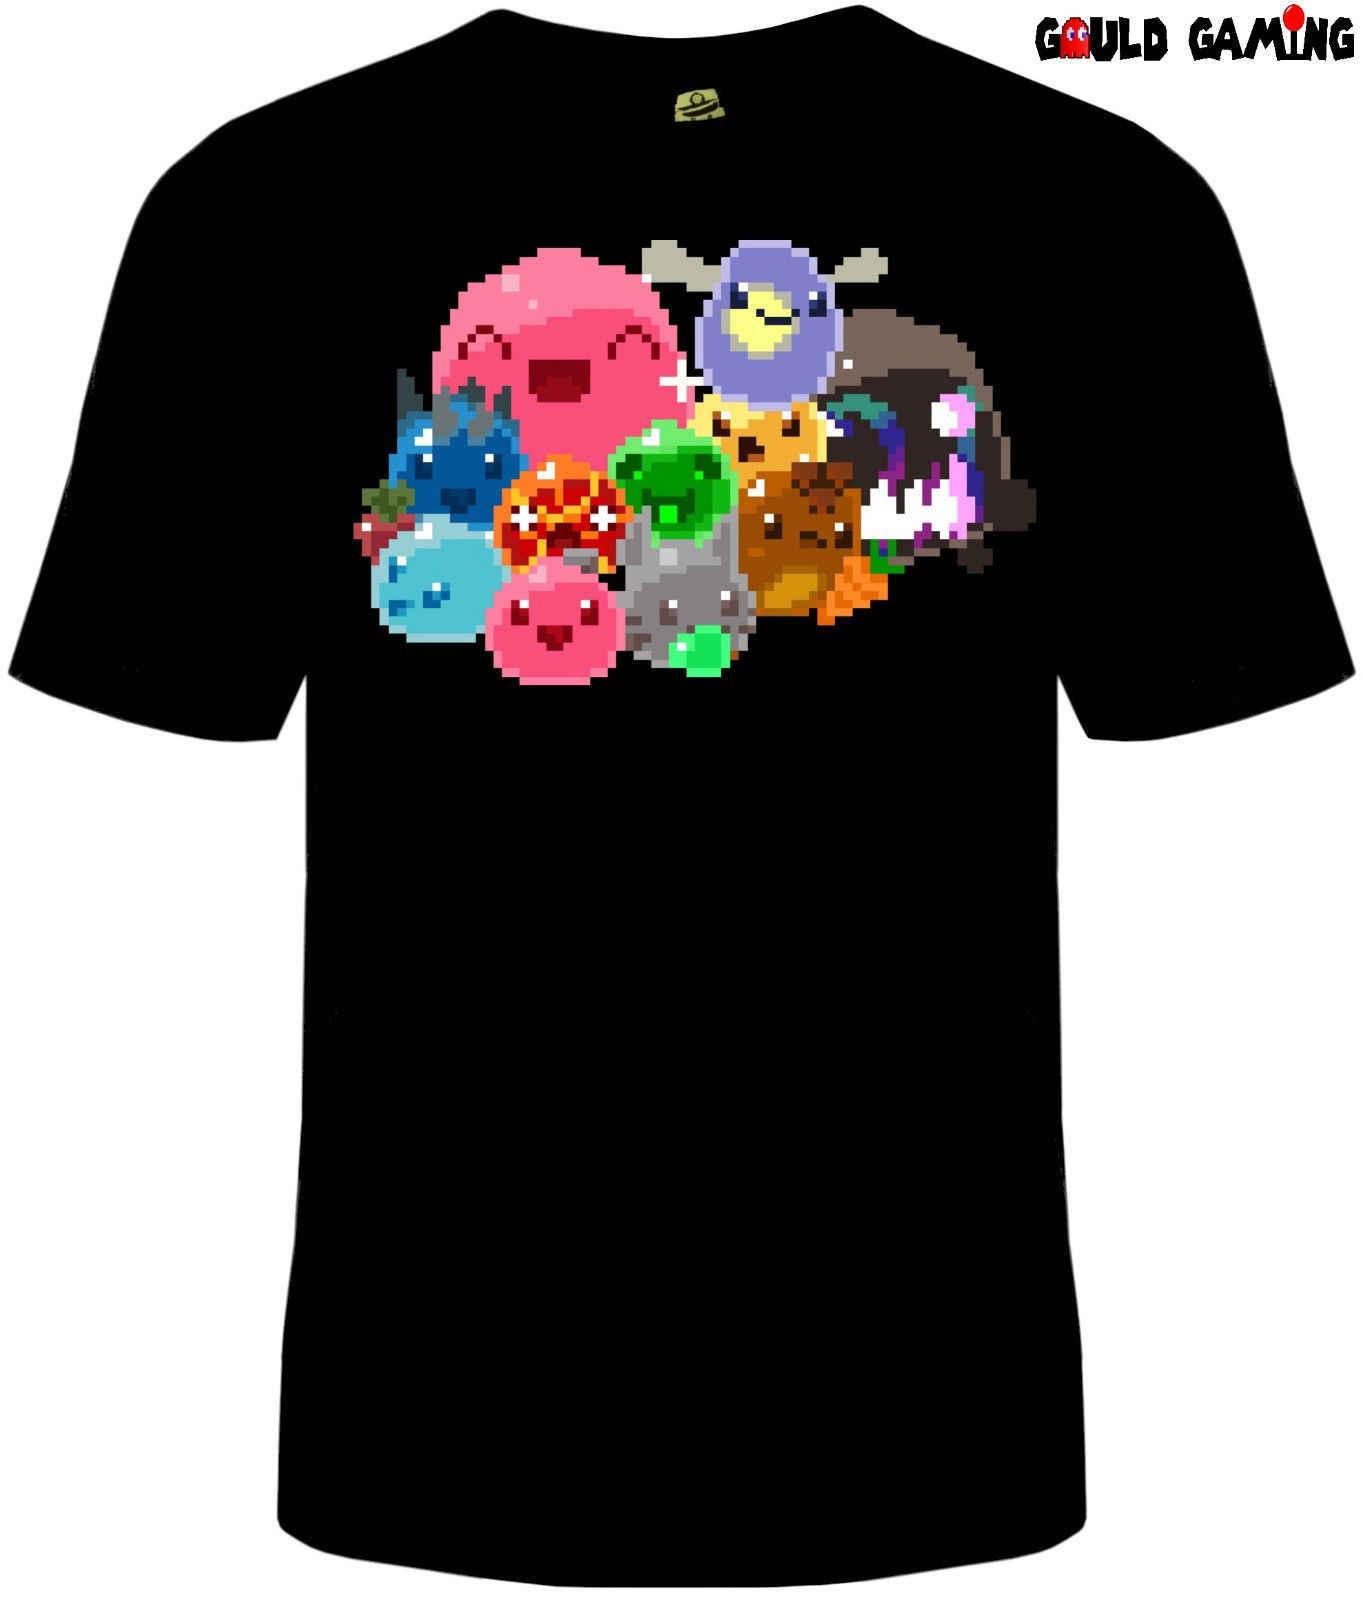 Slime Rancher 8 bit T Shirt Unisex Mens Cotton Slimes Tarr